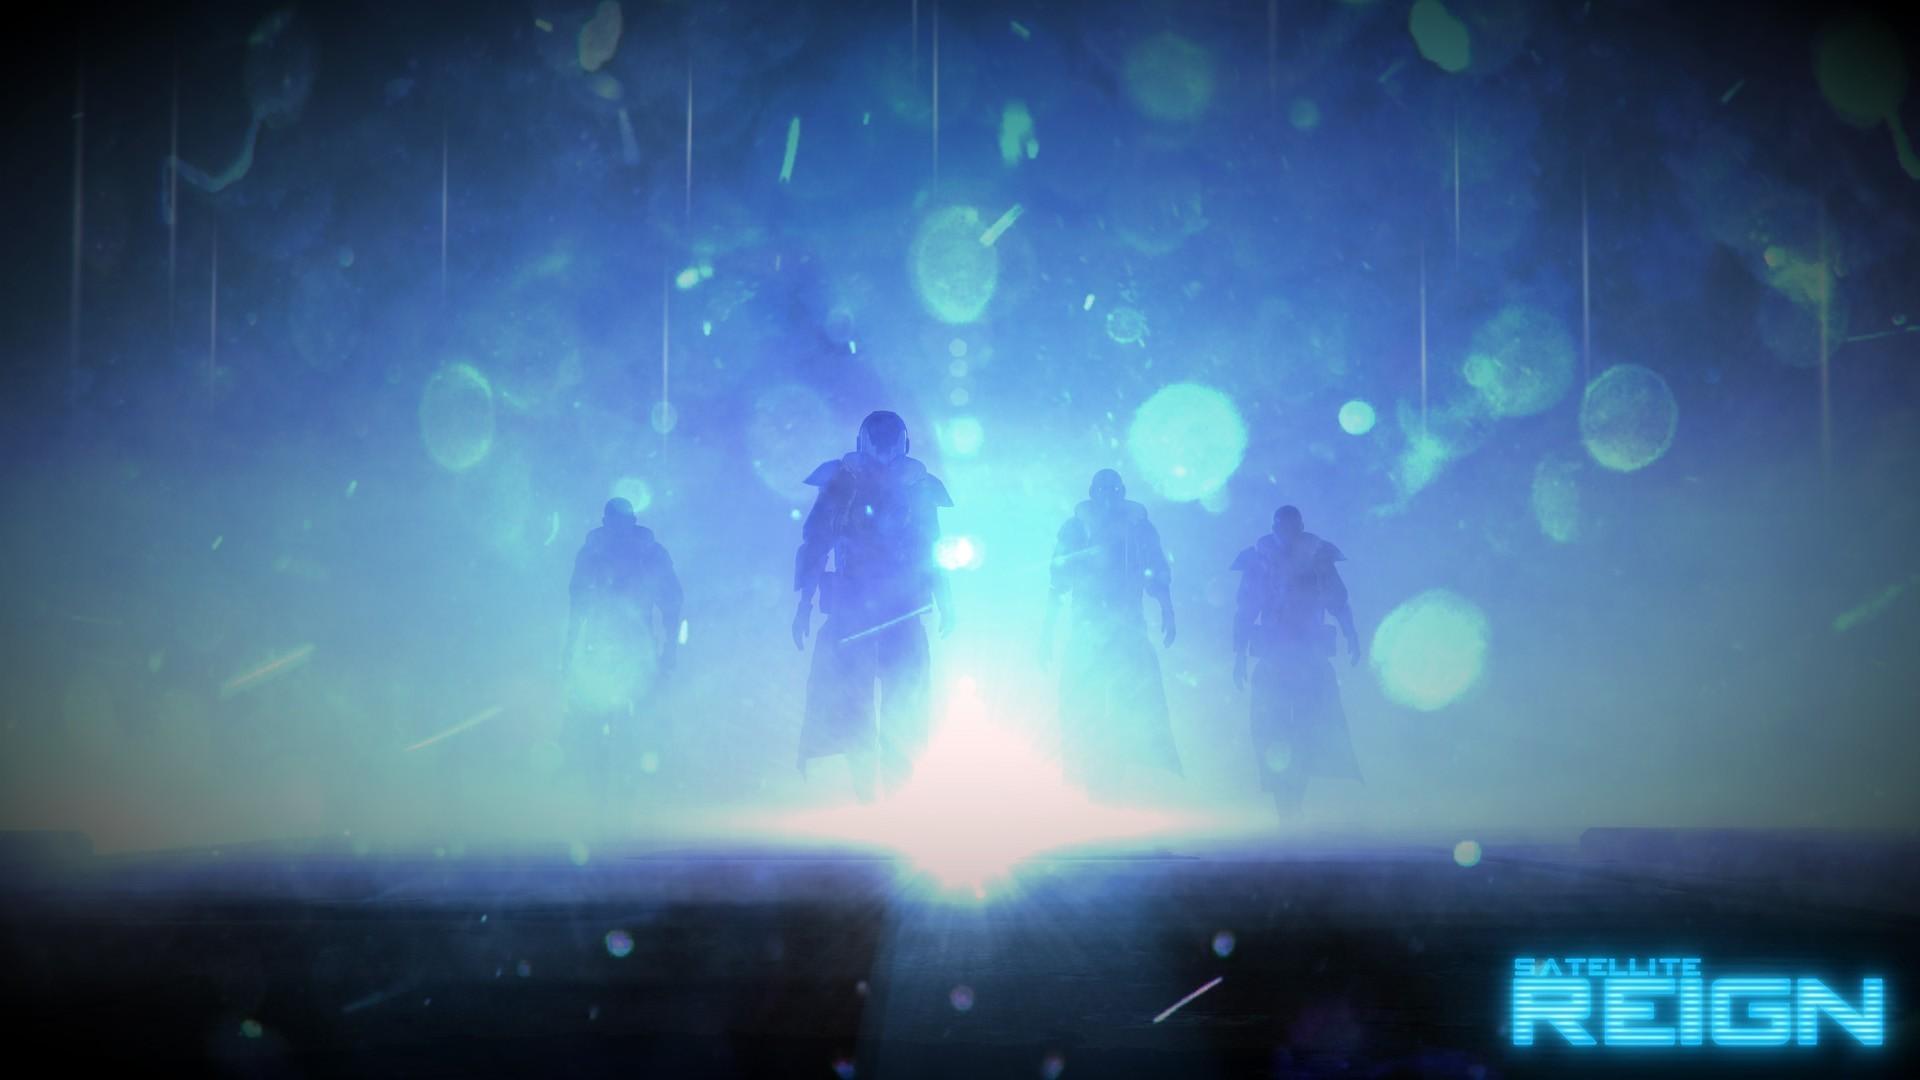 Res: 1920x1080, Studios indie games satellite reign cyberpunk dystopia wallpaper